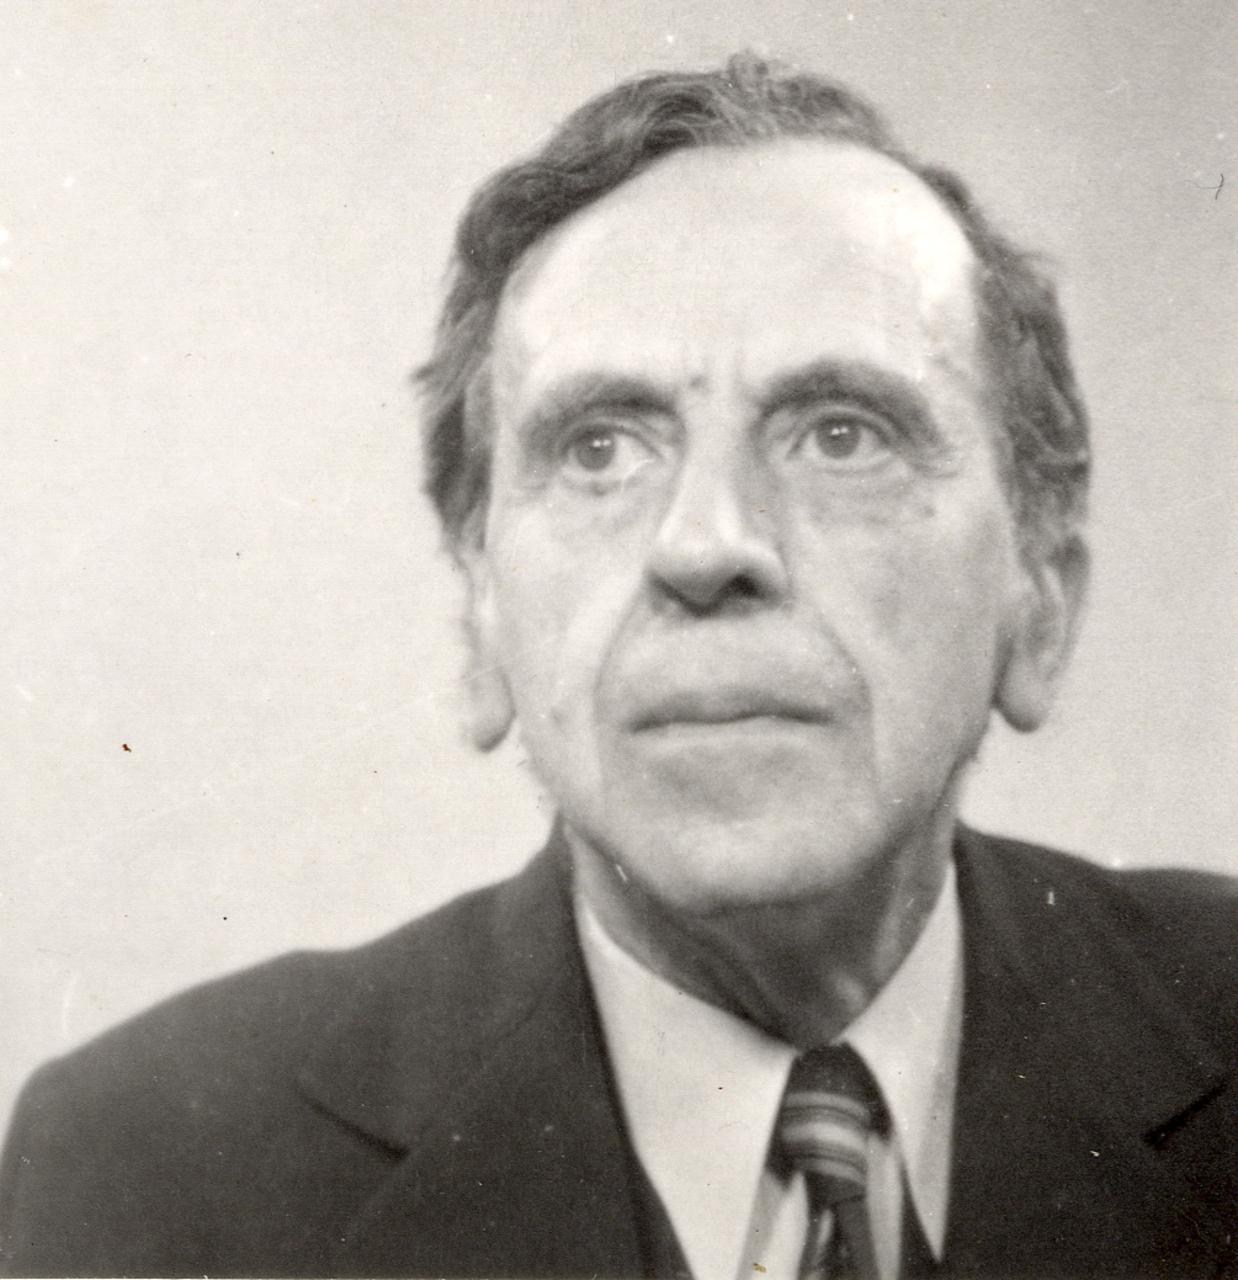 image for Baruzi, Jean et Joseph (1881-1953 et 1876-1952)